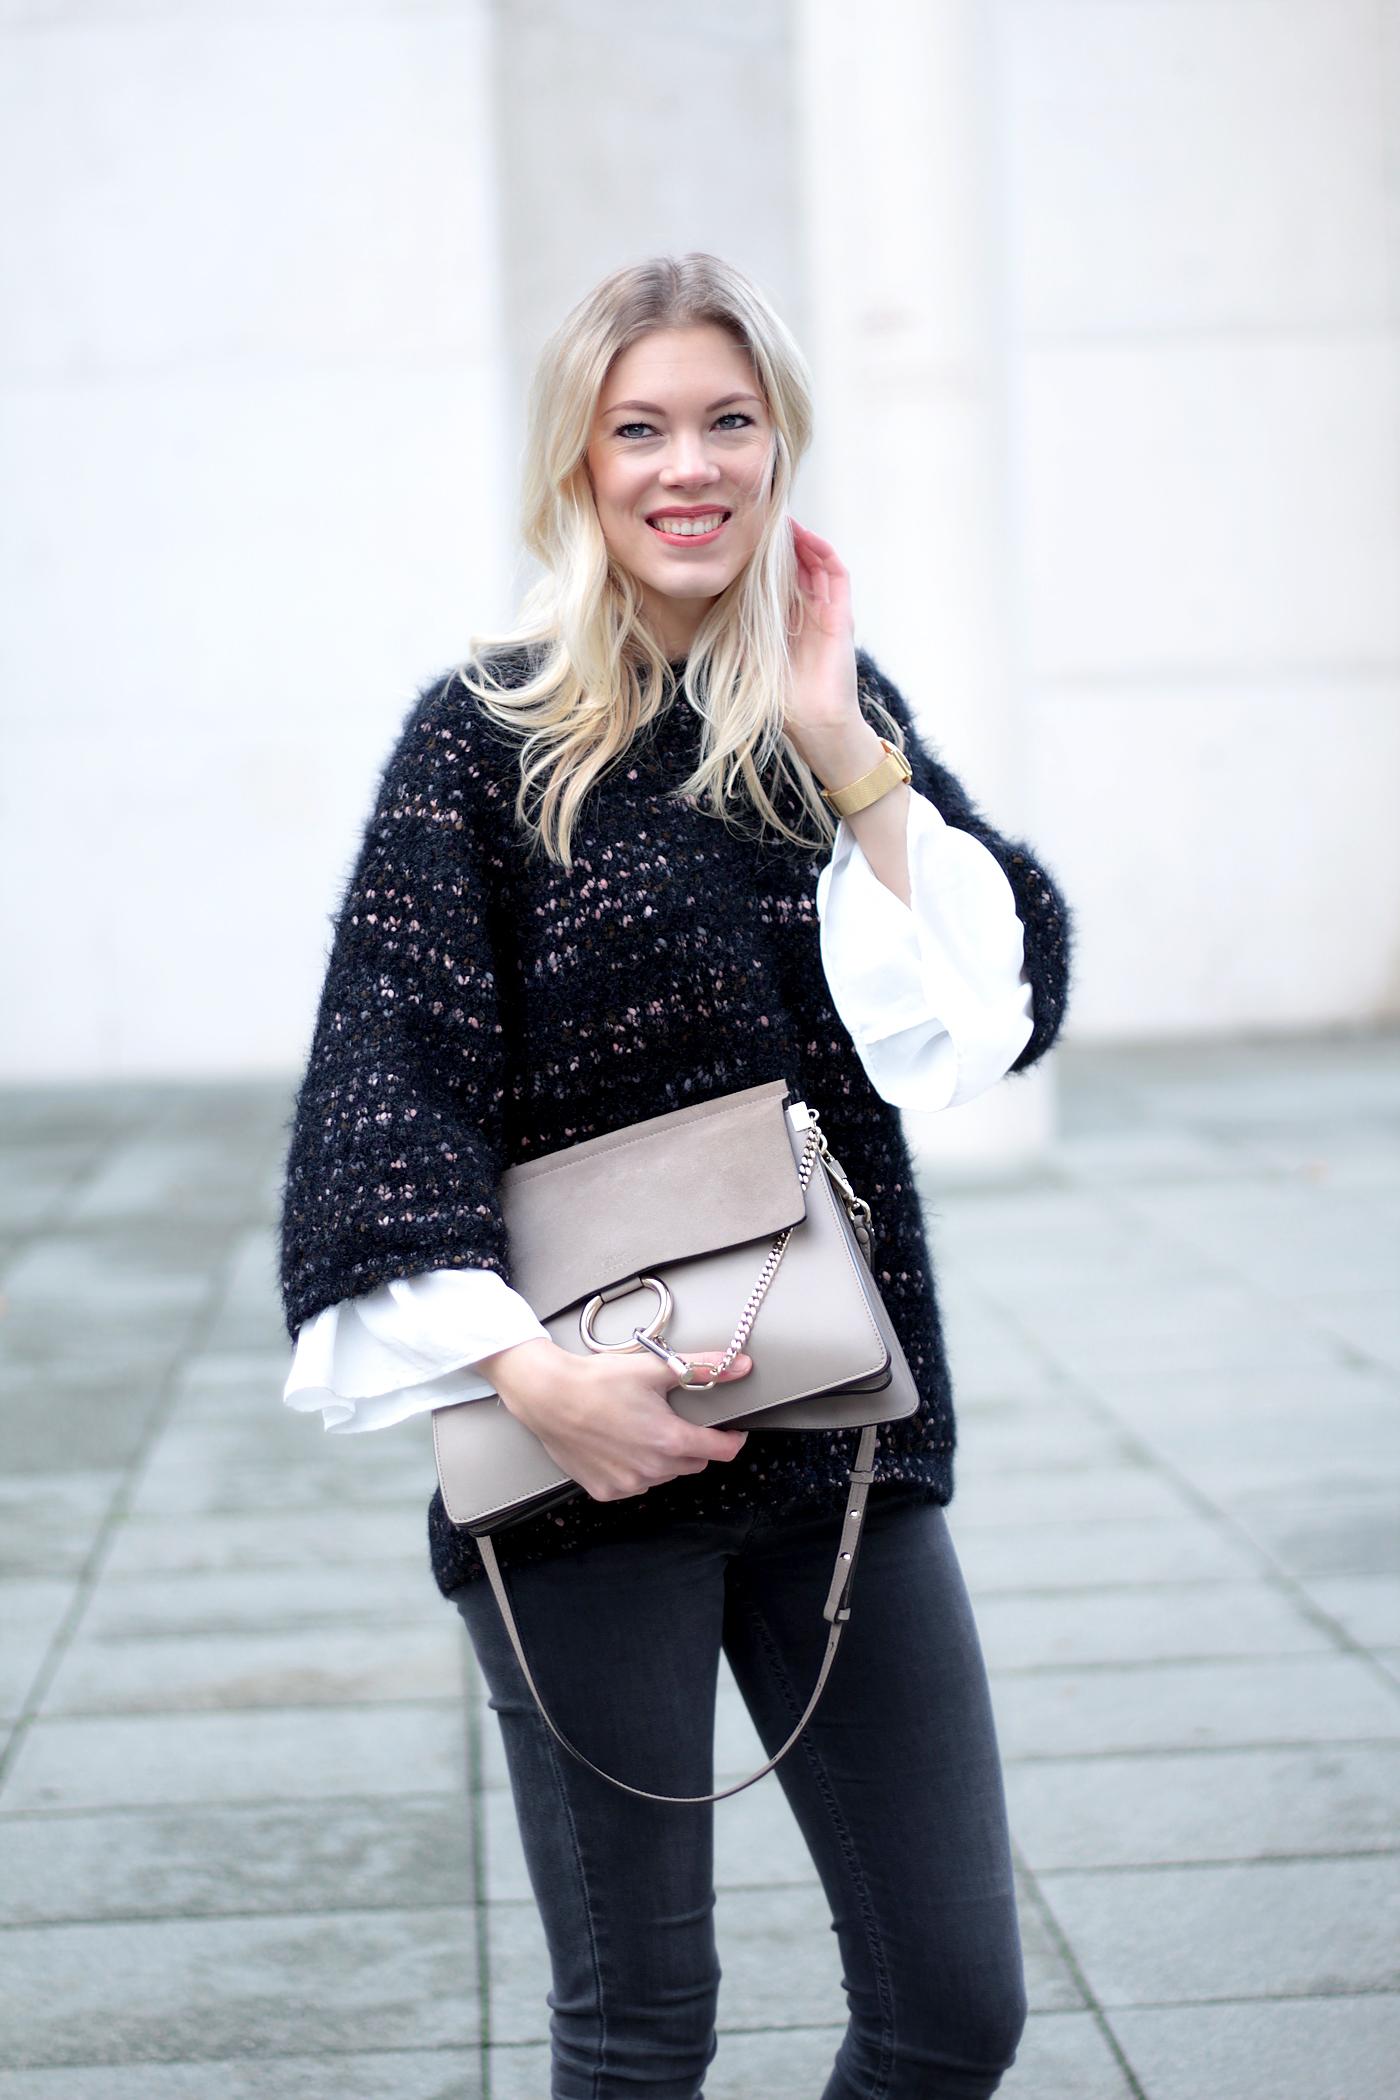 somehappyshoes_verenajulia_fashionblog_streetstyle_zara_asos_chloe